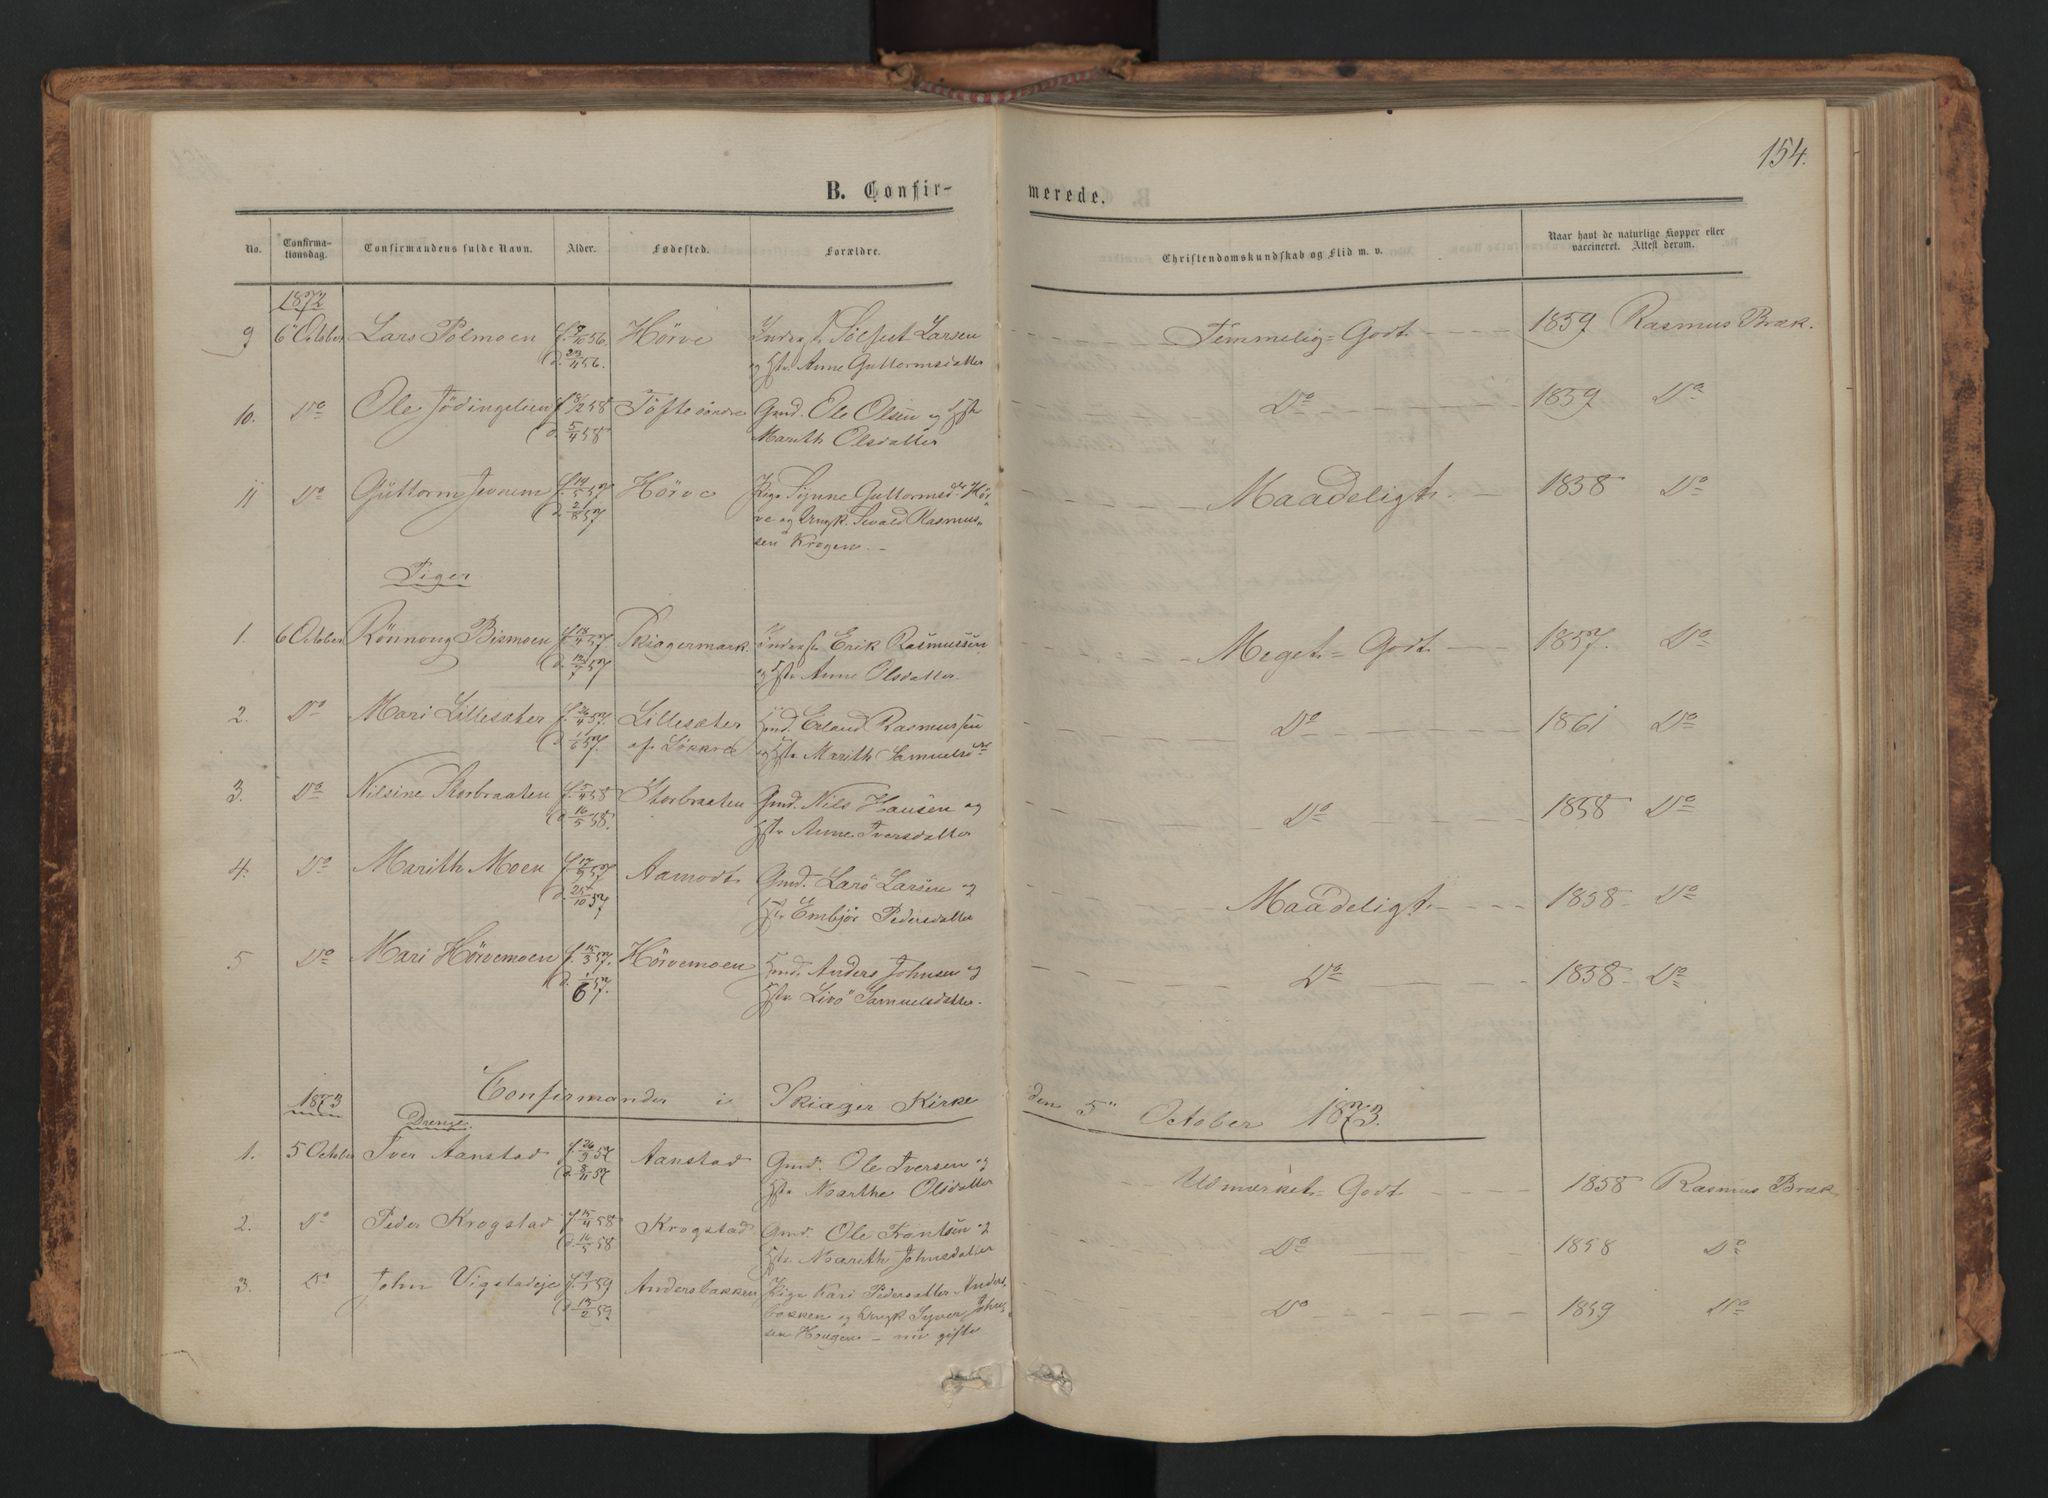 SAH, Skjåk prestekontor, Ministerialbok nr. 1, 1863-1879, s. 154